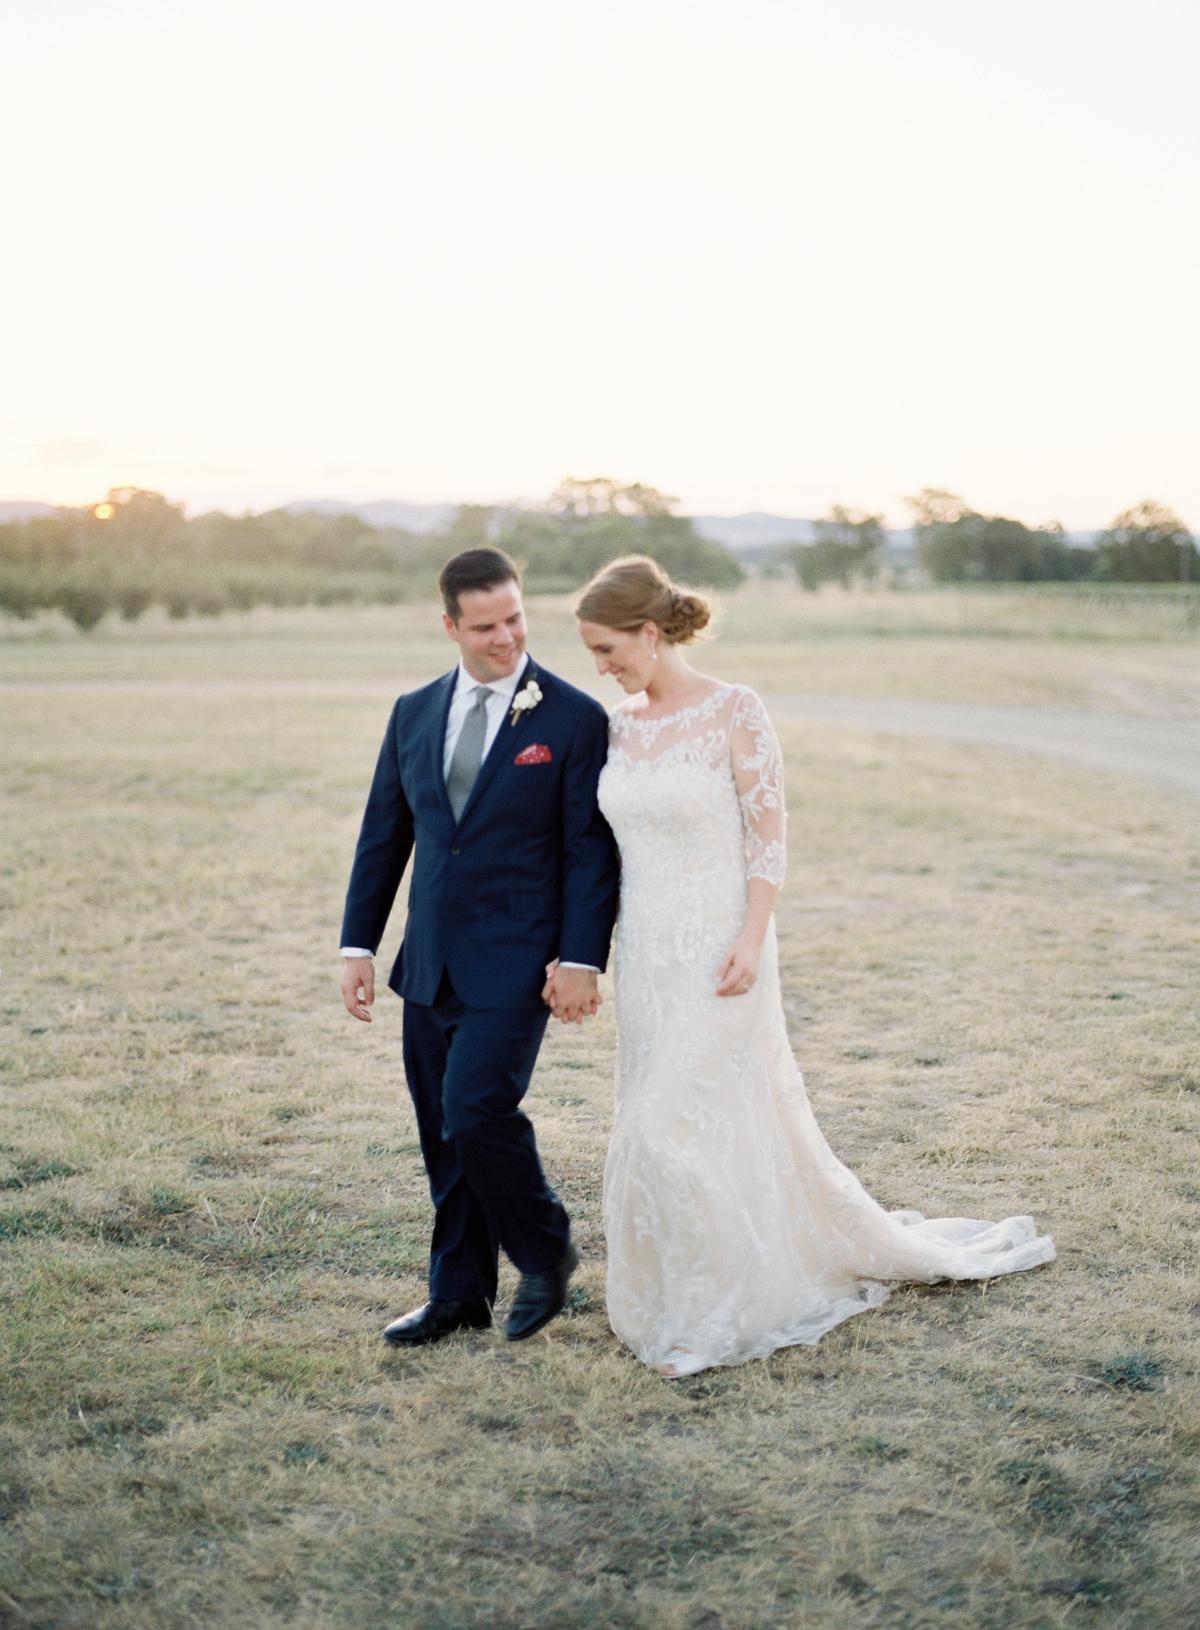 The Vine Grove Mudgee Wedding, Photography by Mr Edwards_1825.jpg